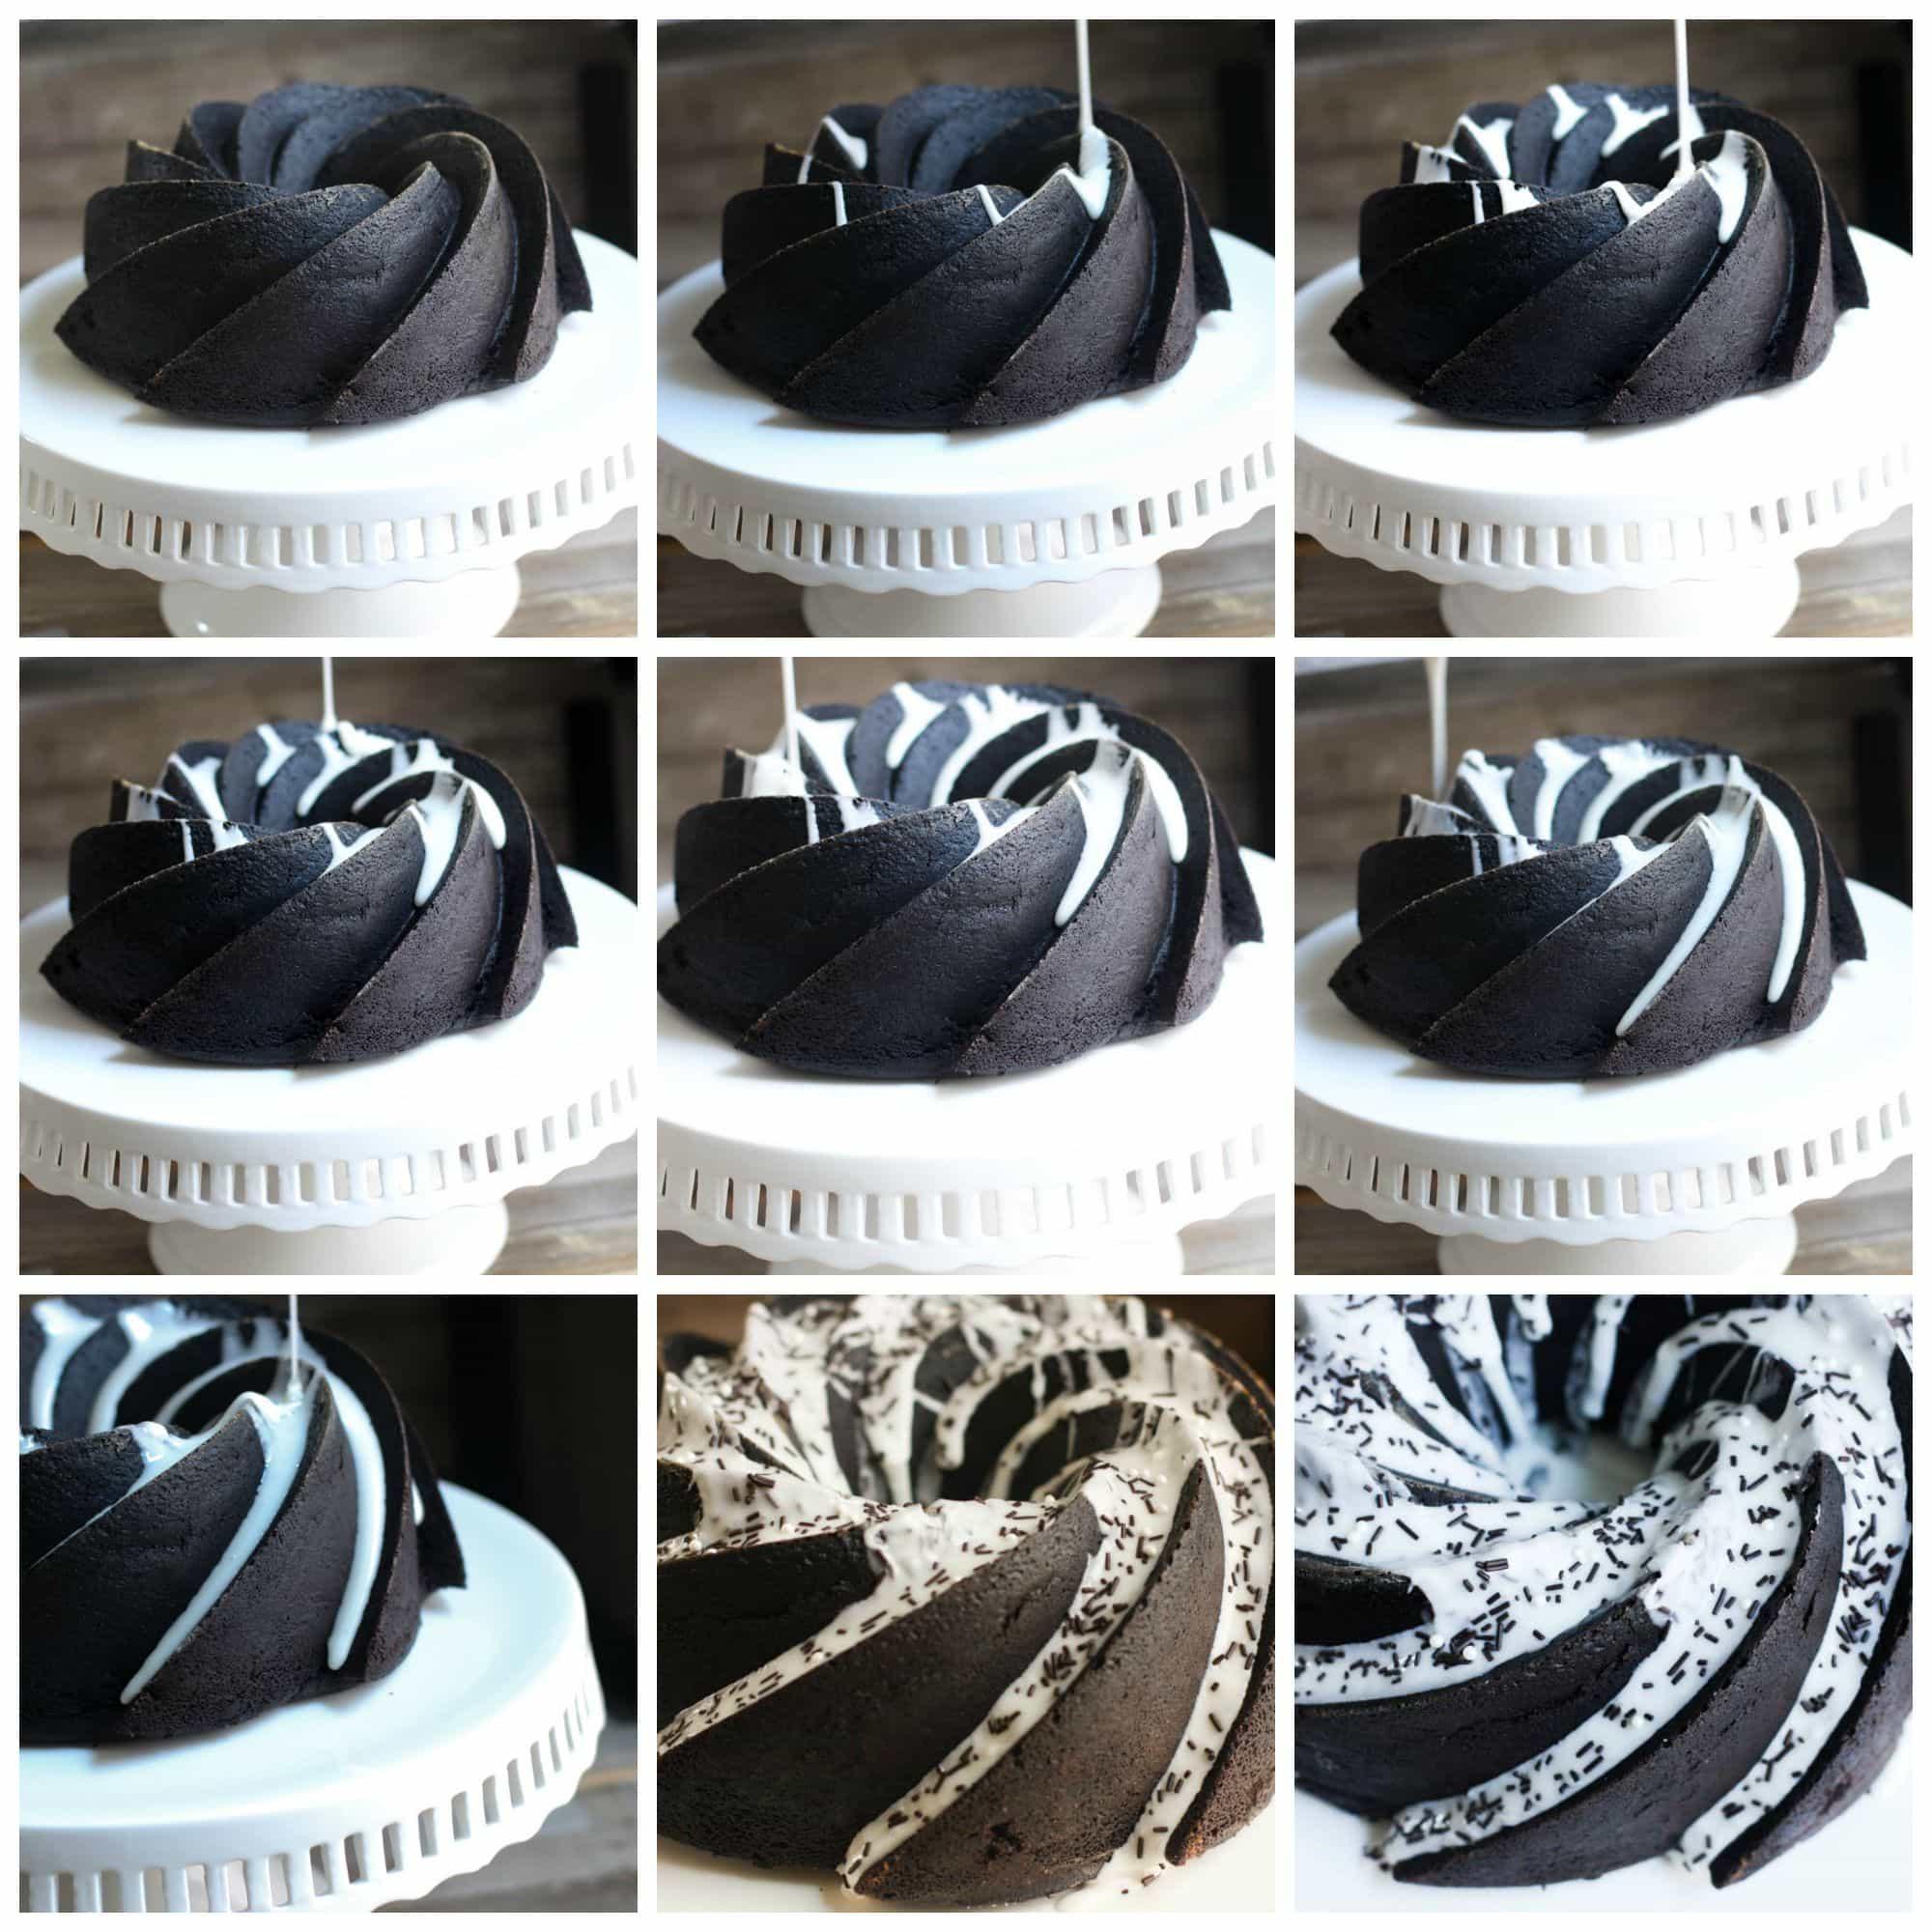 Chocolate Sprinkles Sour Cream Bundt Cake